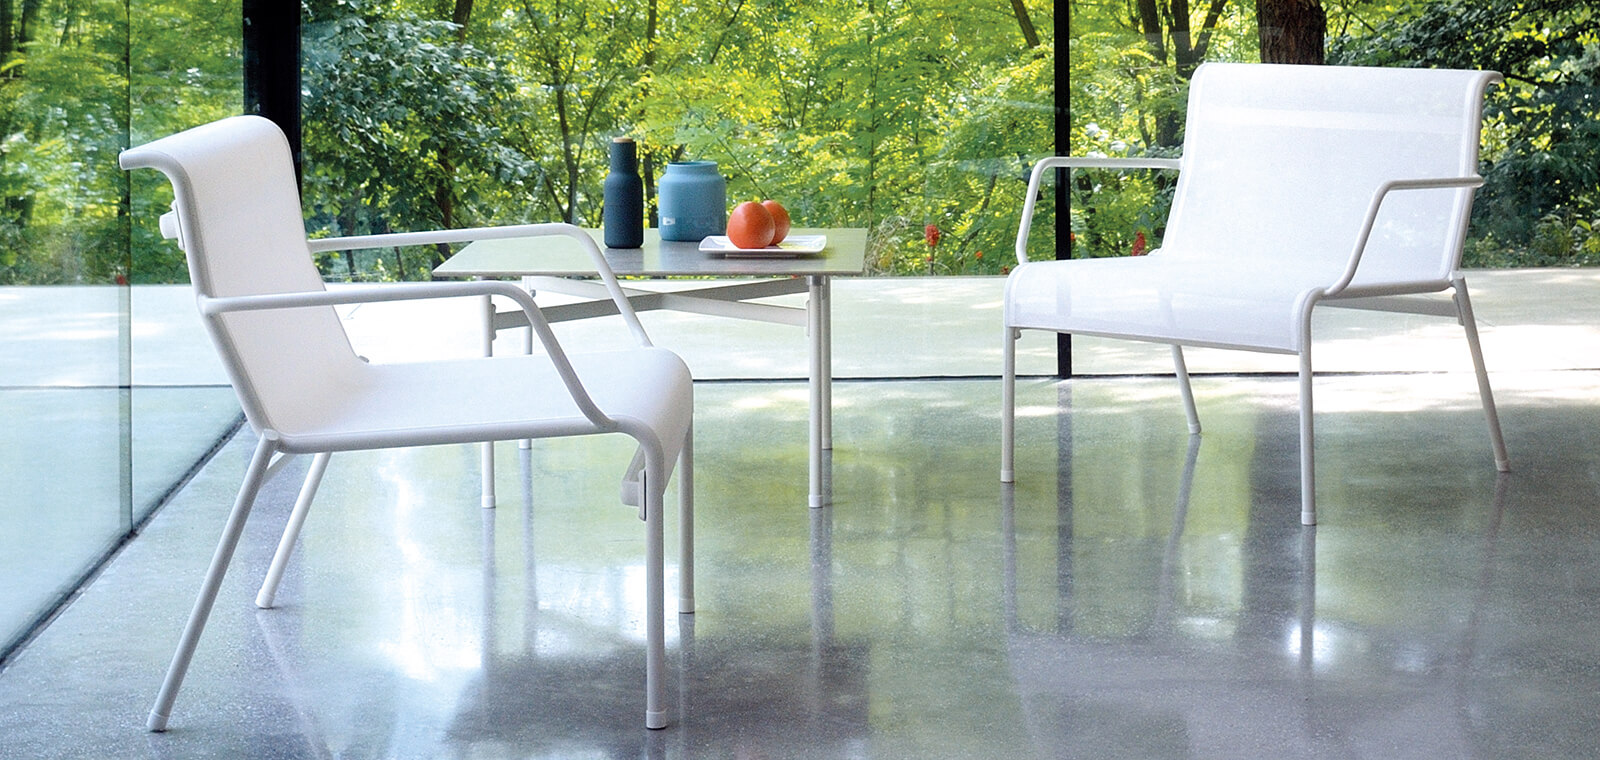 muebles kira terraza emu mallorca